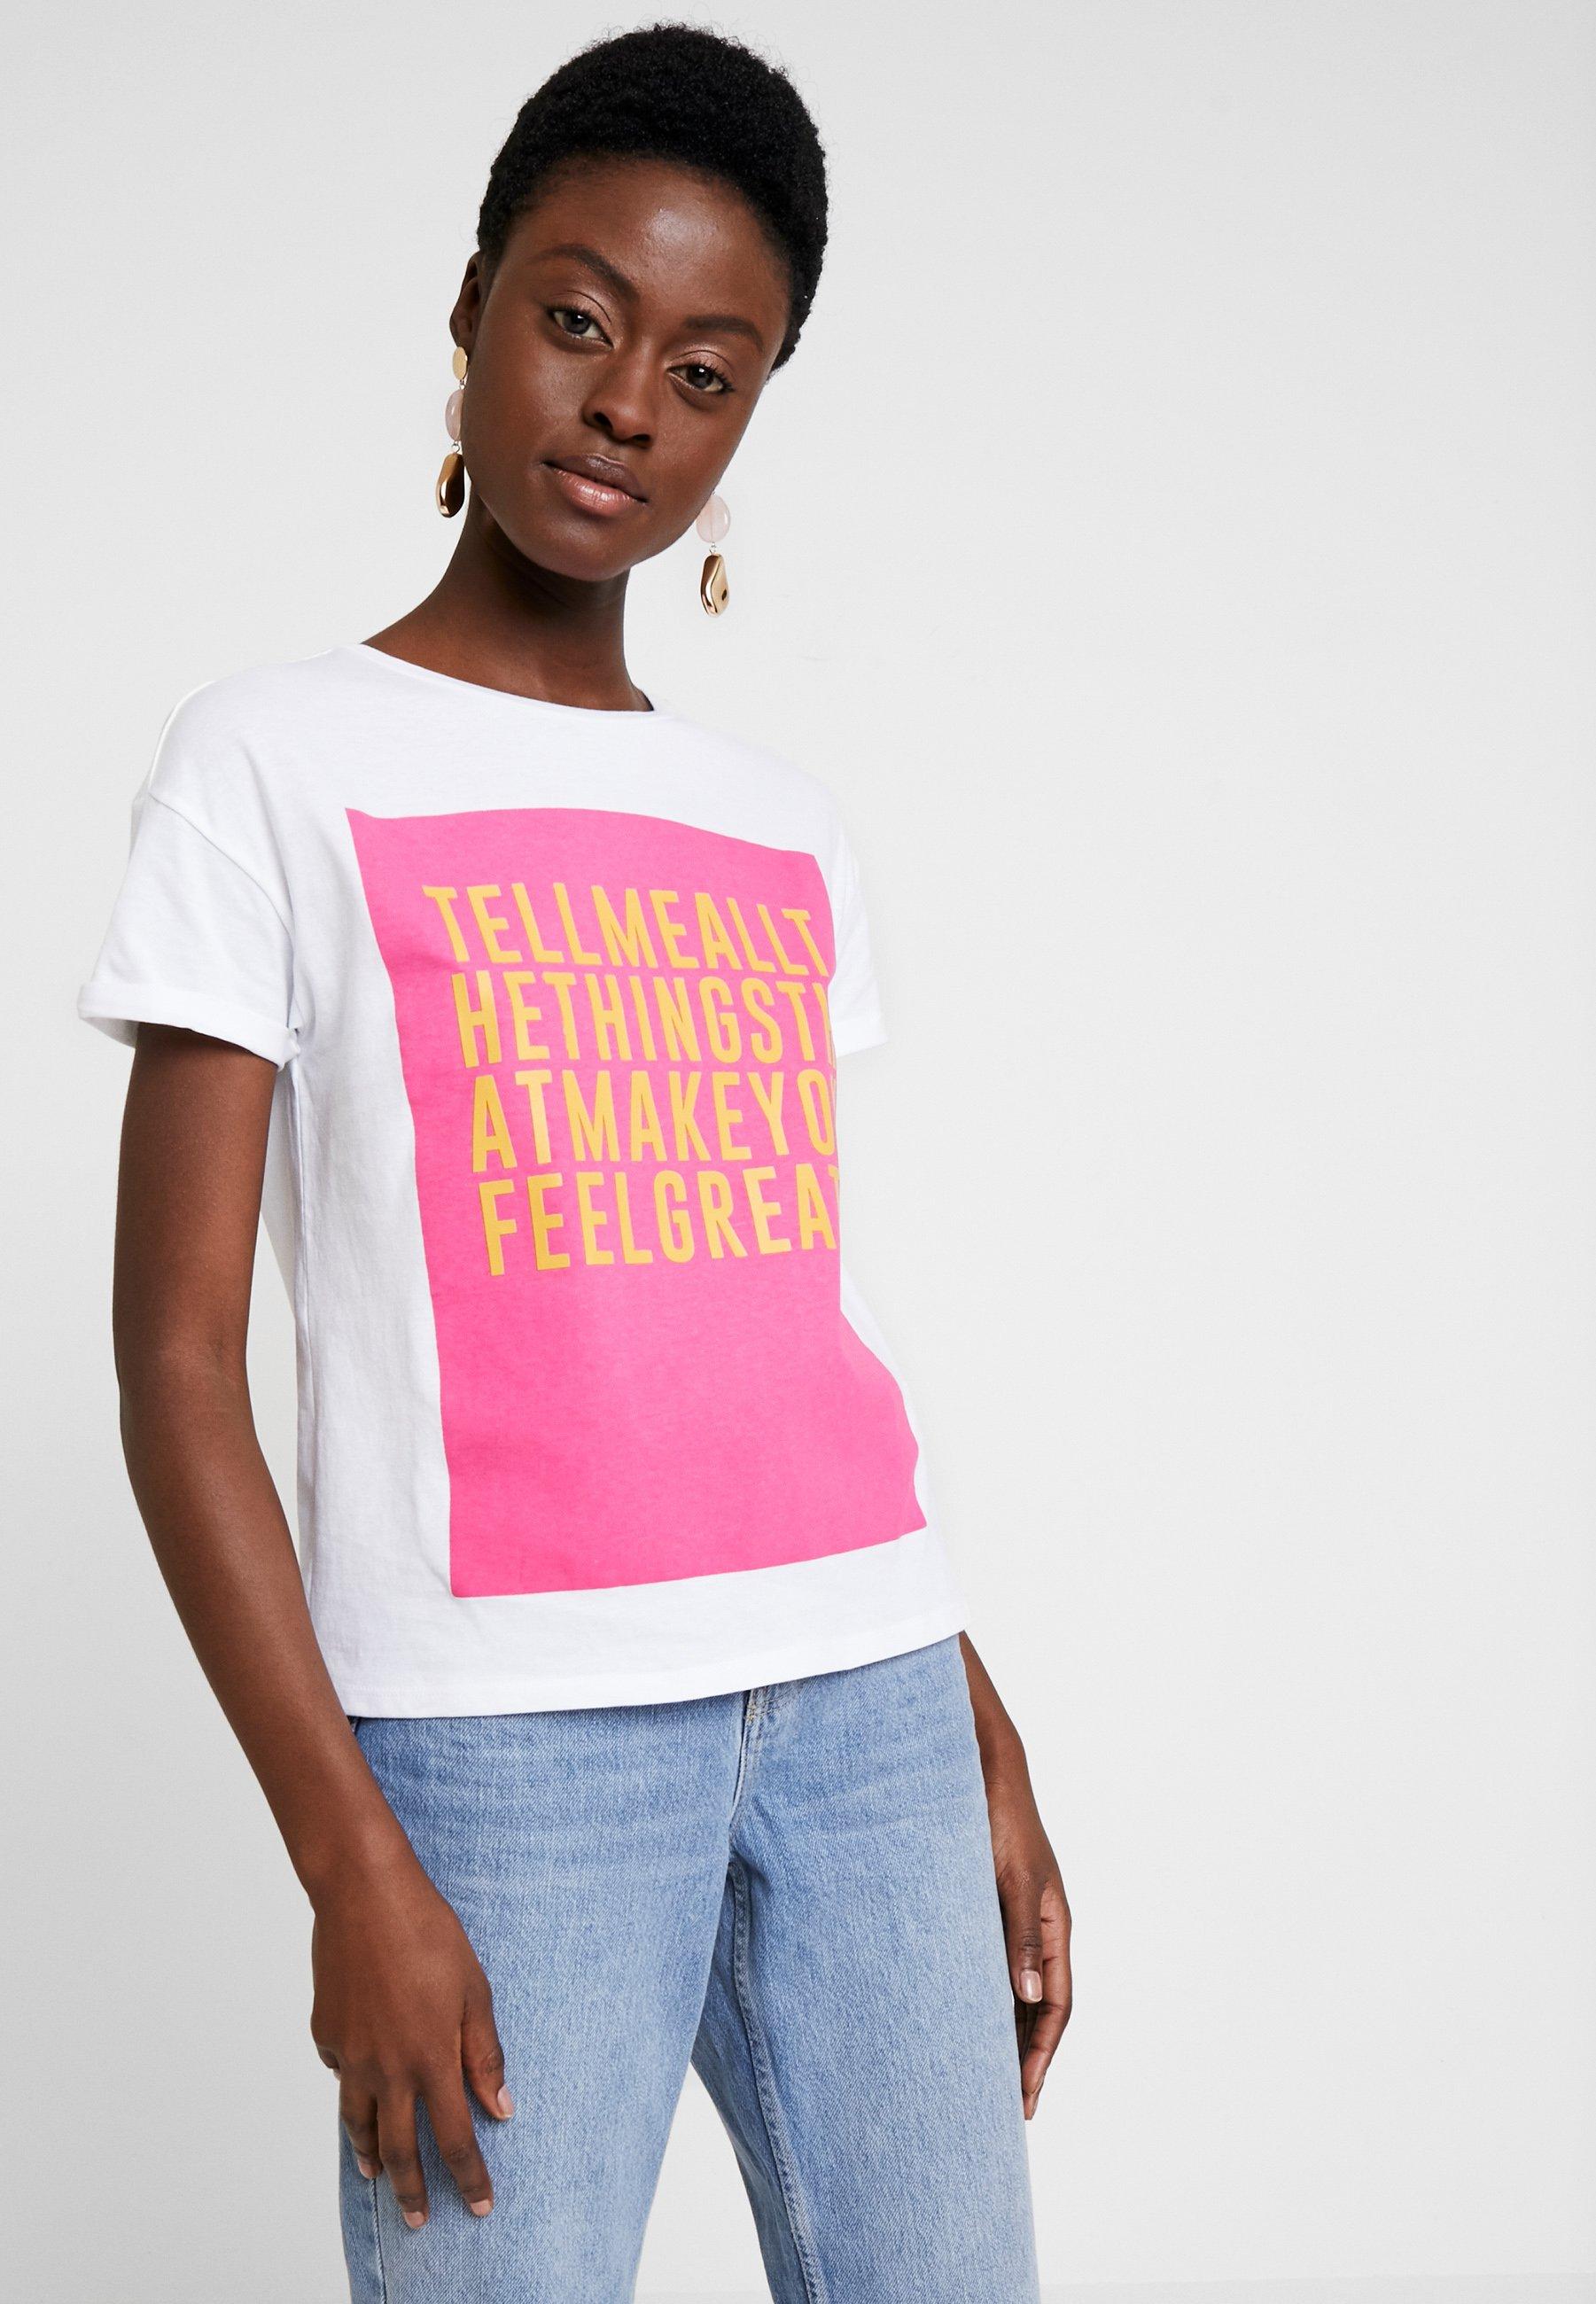 Imprimé Several shirt TextT Imprimé TextT Springfield Springfield shirt Several QsrCBtxohd